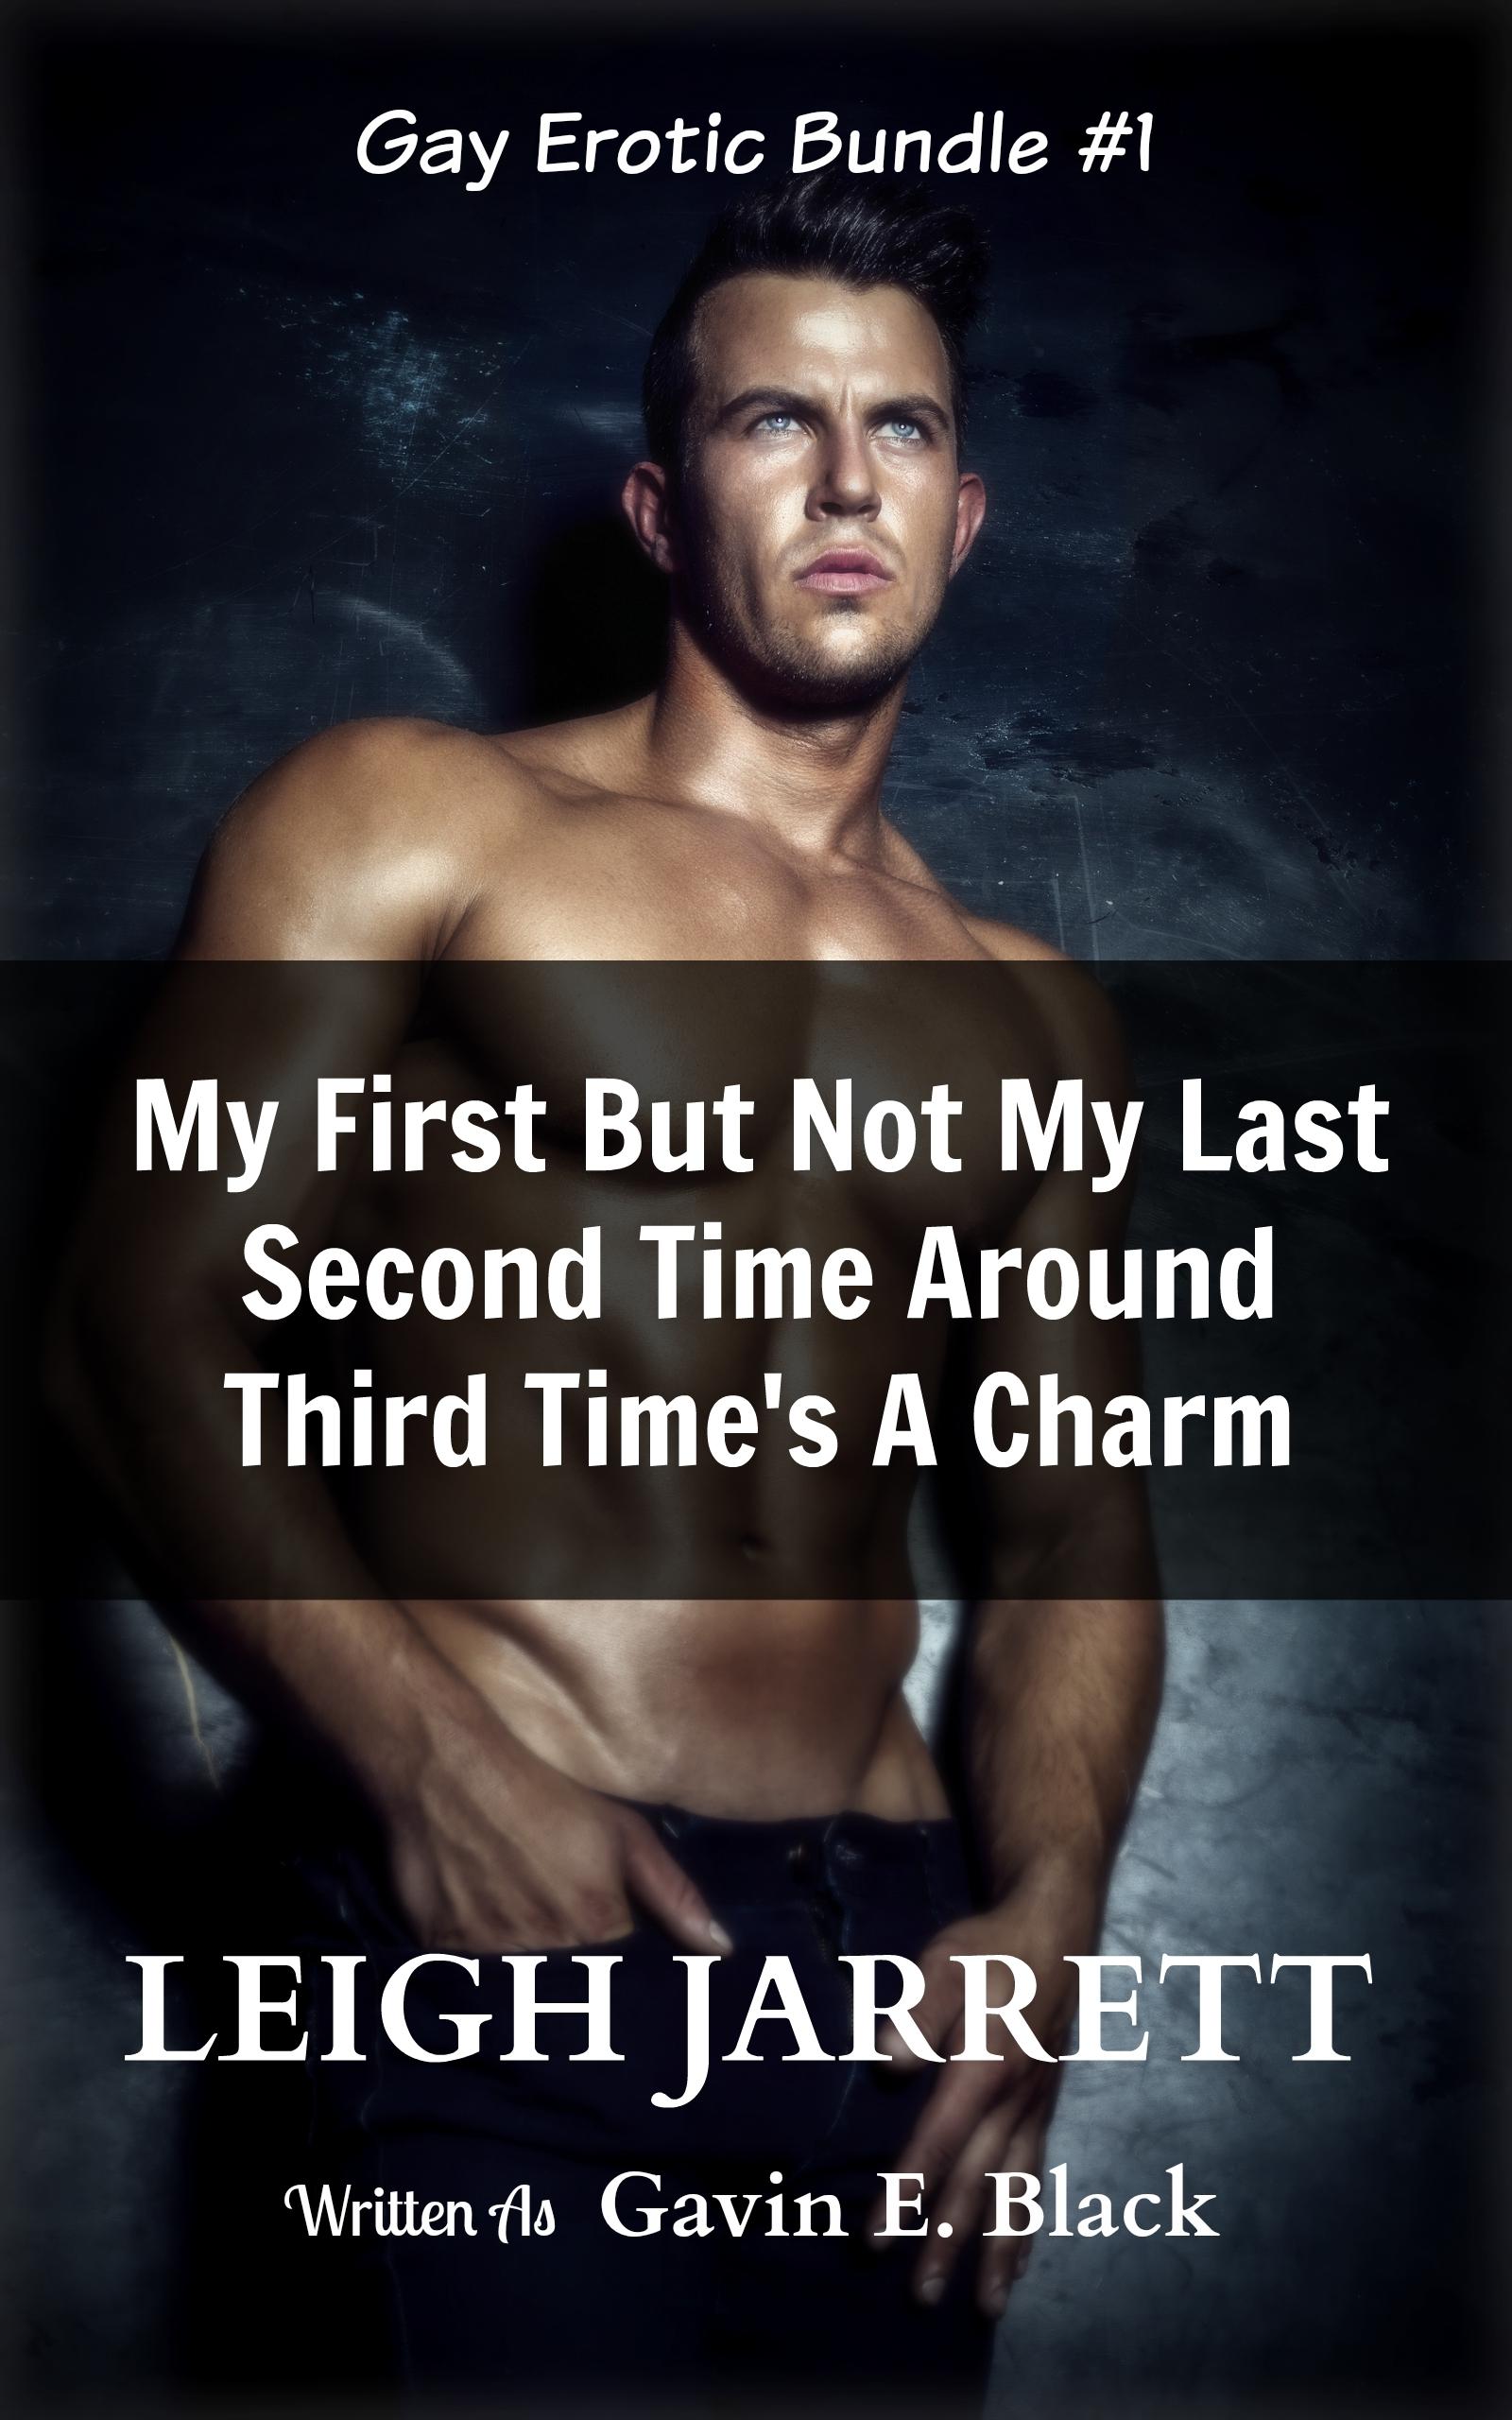 Gay Erotic Bundle #1 Leigh Jarrett